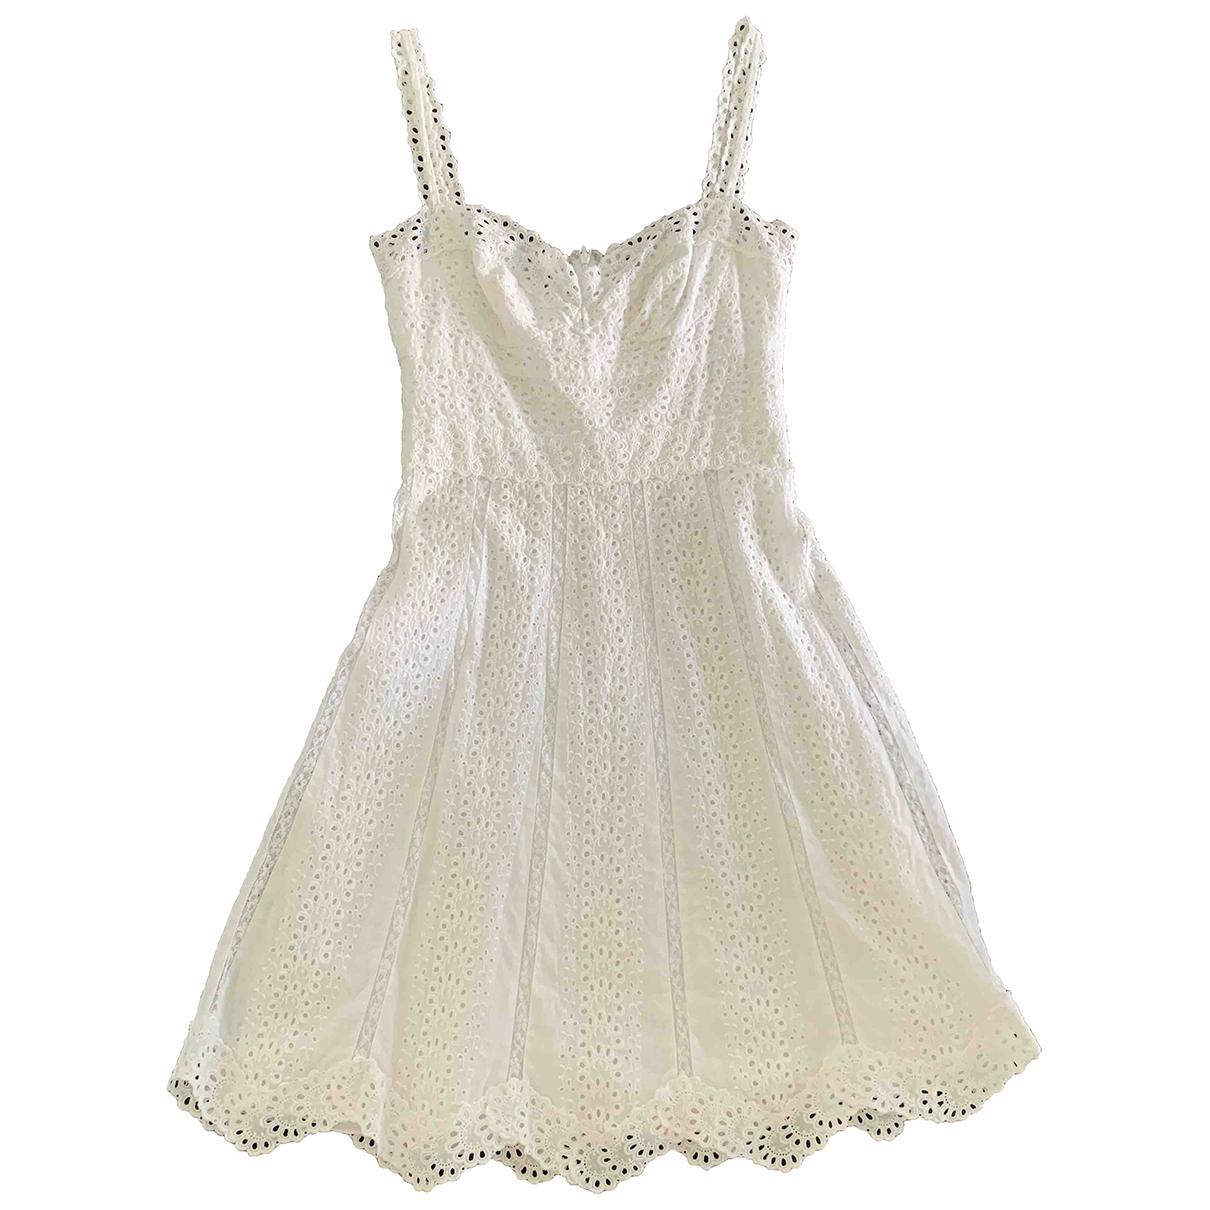 Collette Dinnigan \N White Cotton dress for Women S International